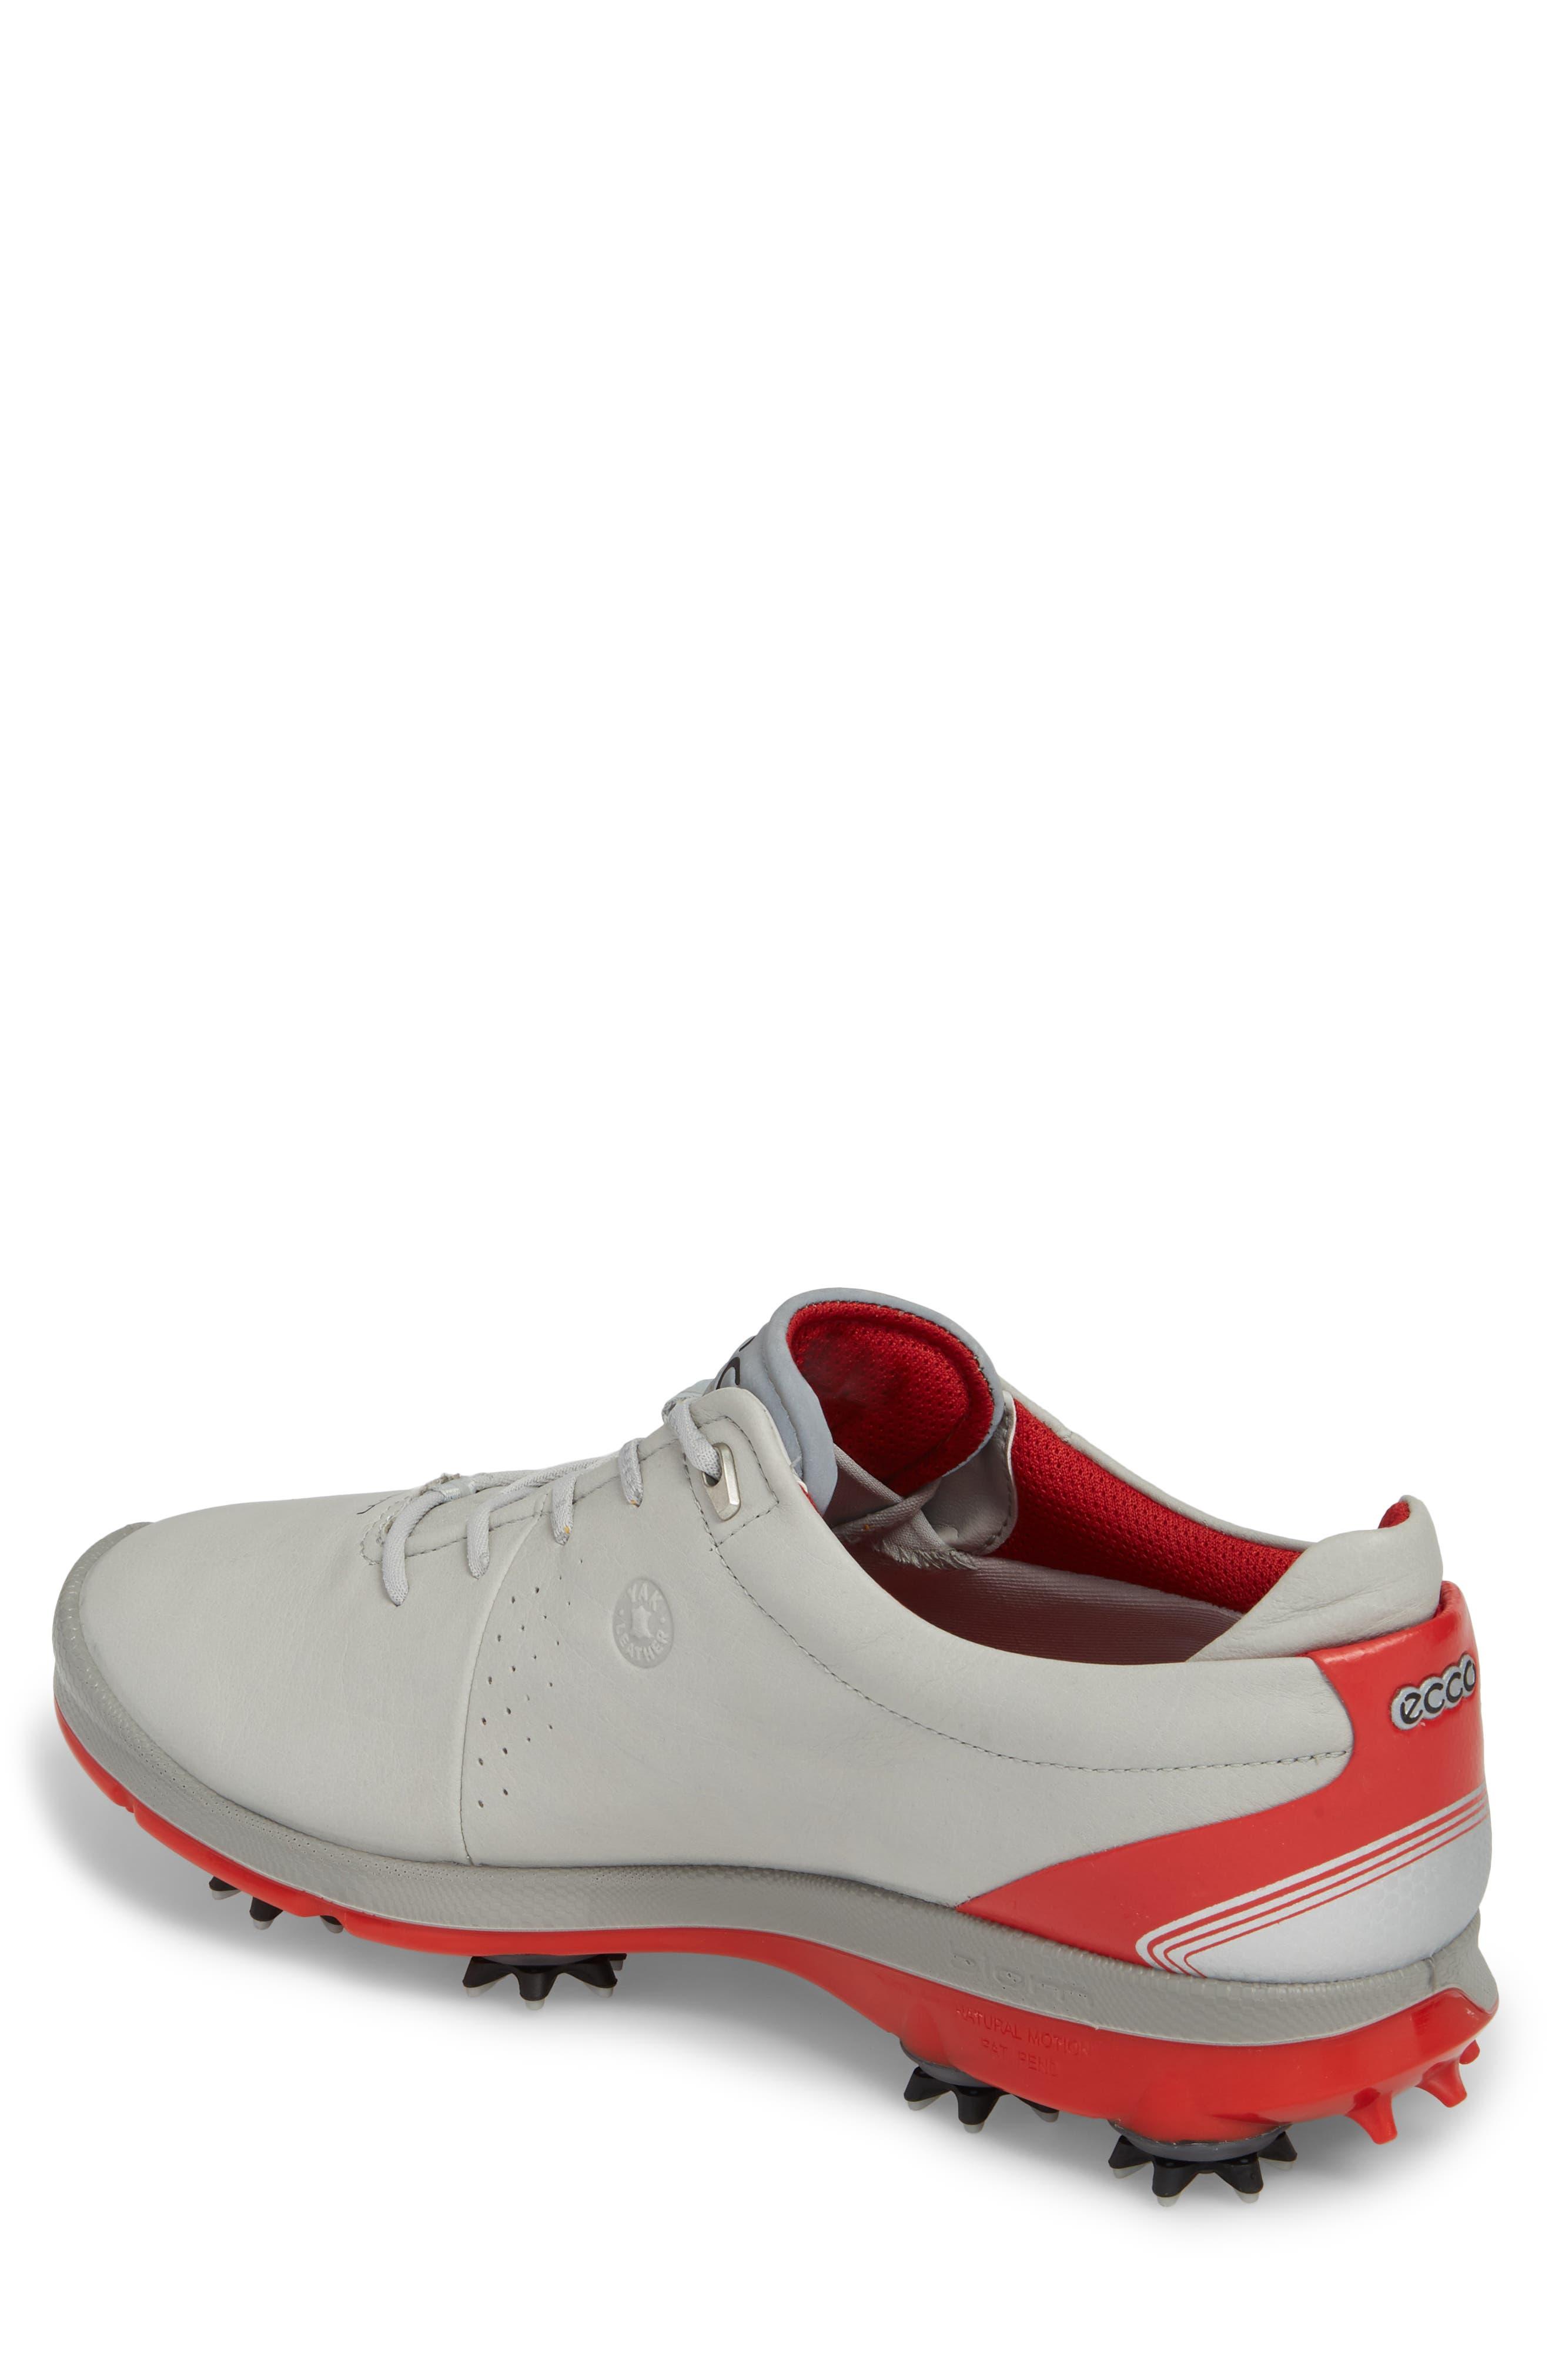 BIOM G 2 Free Gore-Tex<sup>®</sup> Golf Shoe,                             Alternate thumbnail 2, color,                             CONCRETE/ SCARLET LEATHER